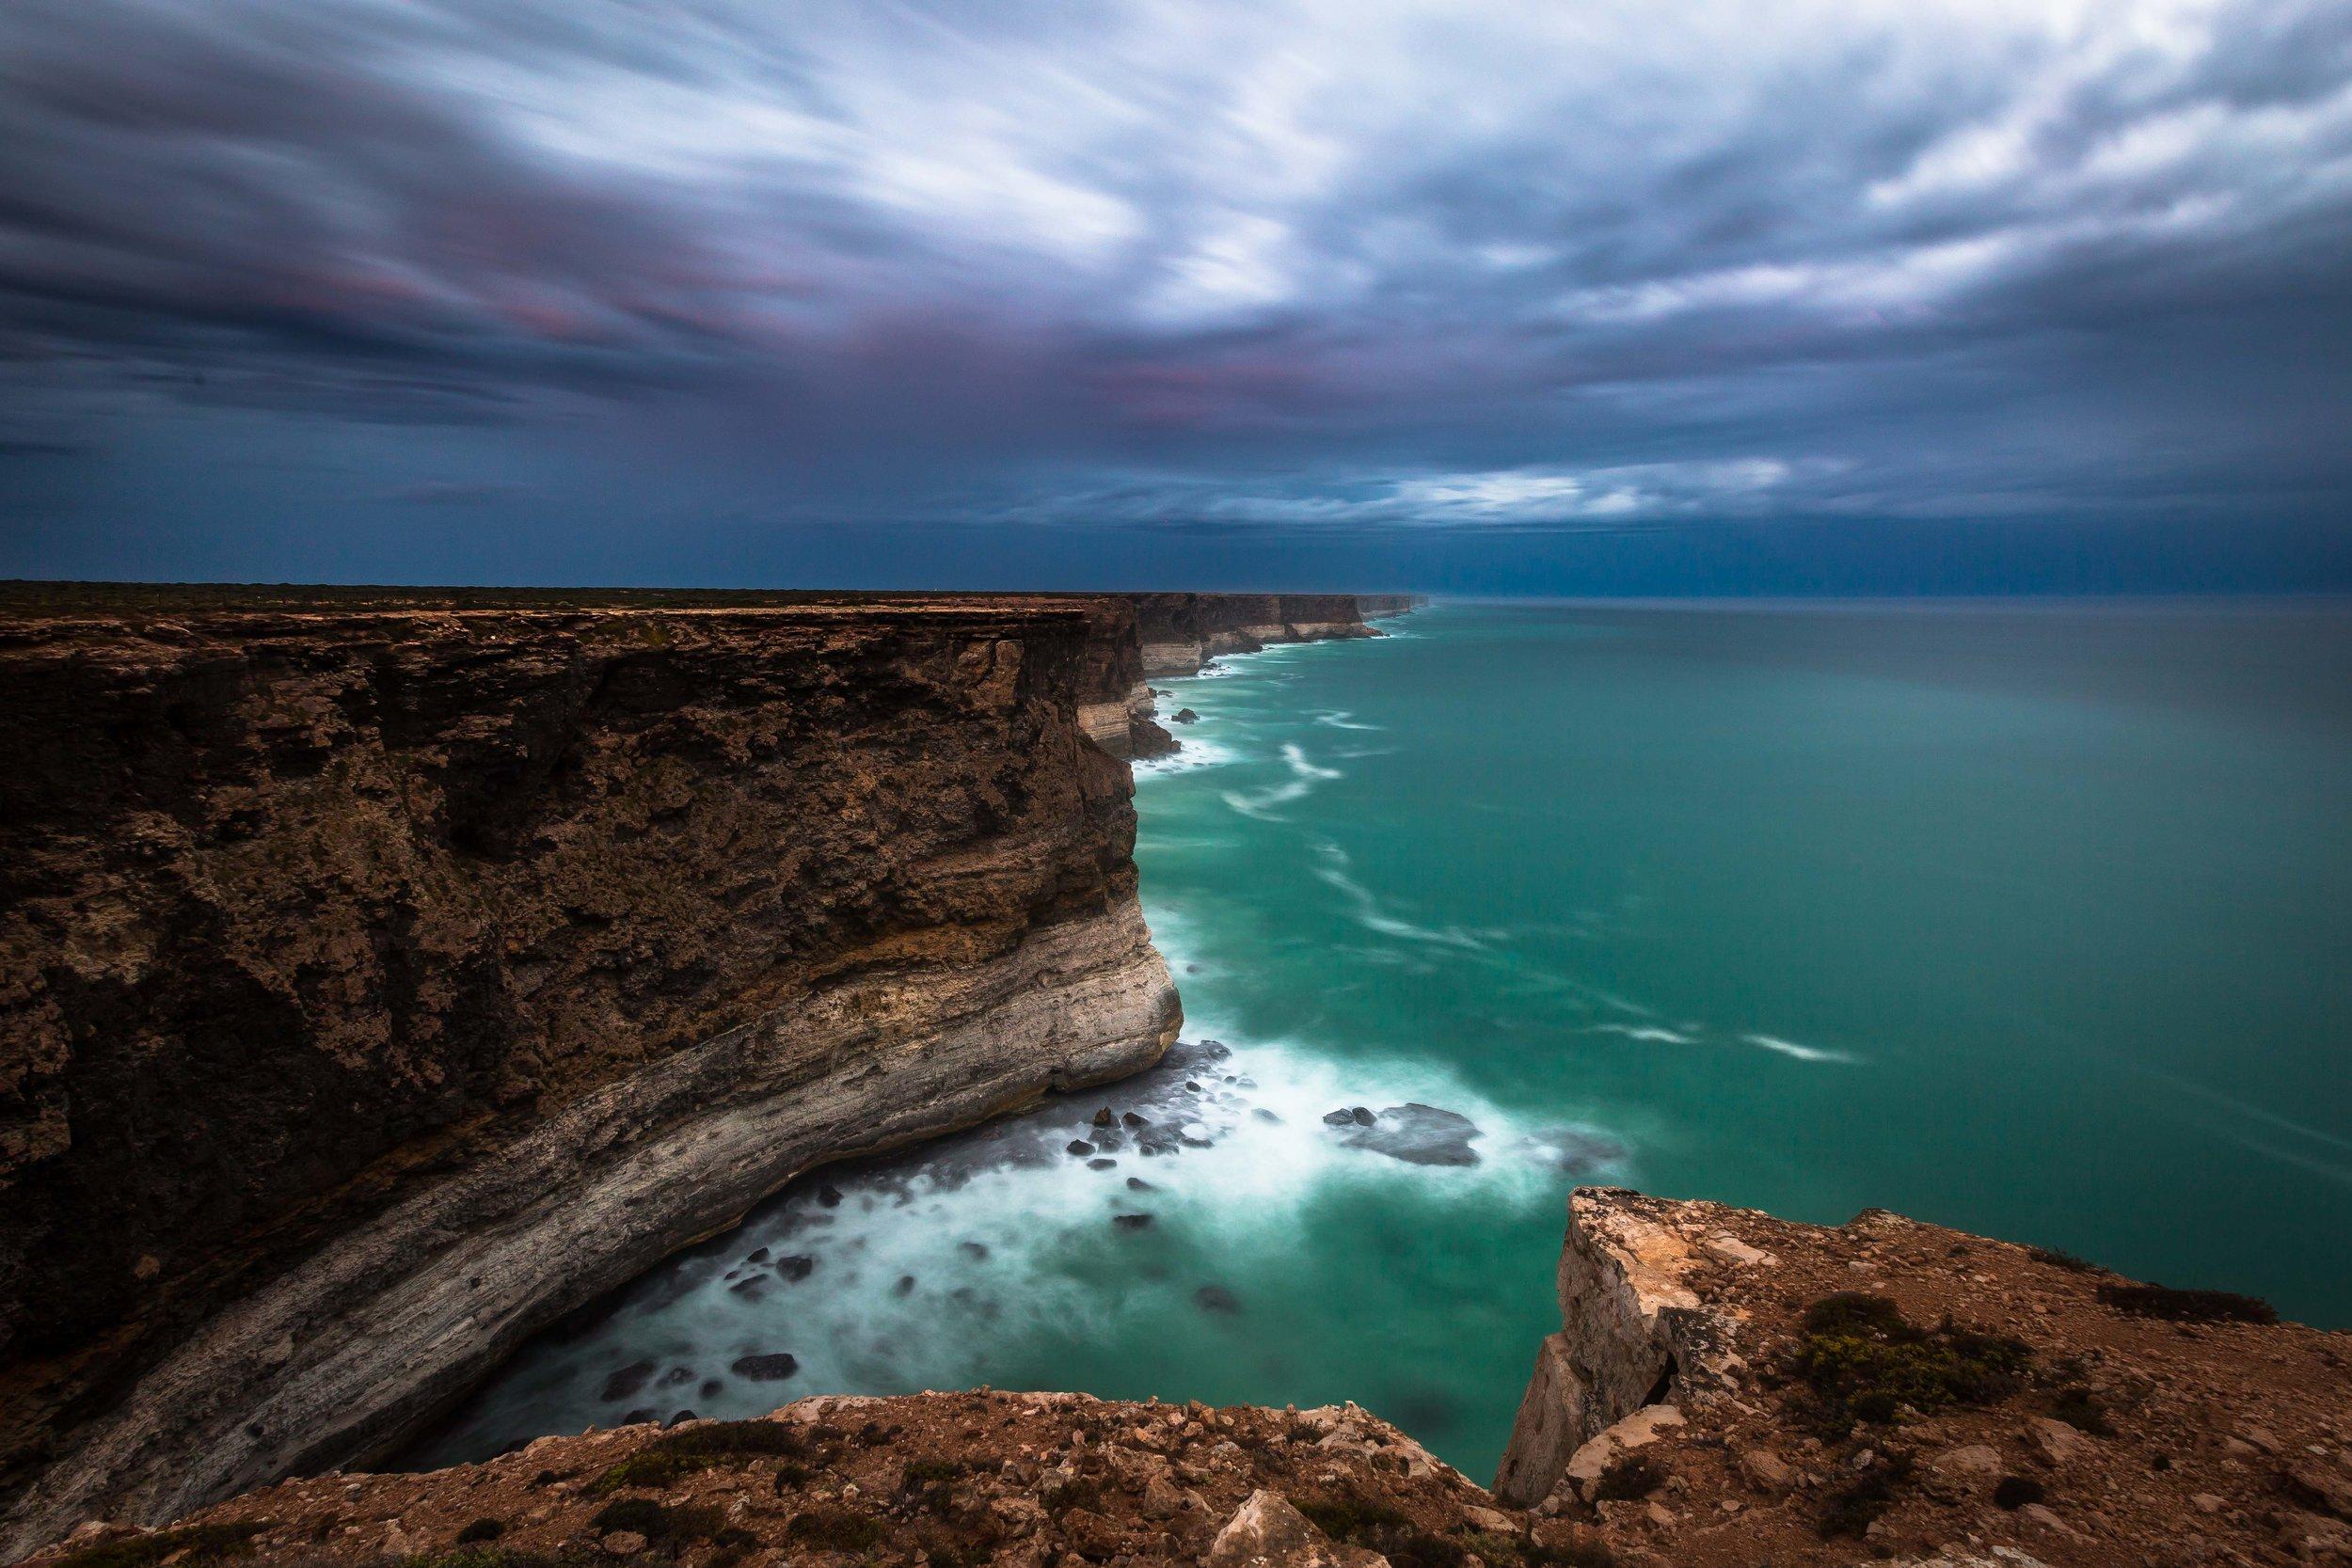 Brad_Great Australian Bight - 5.jpg